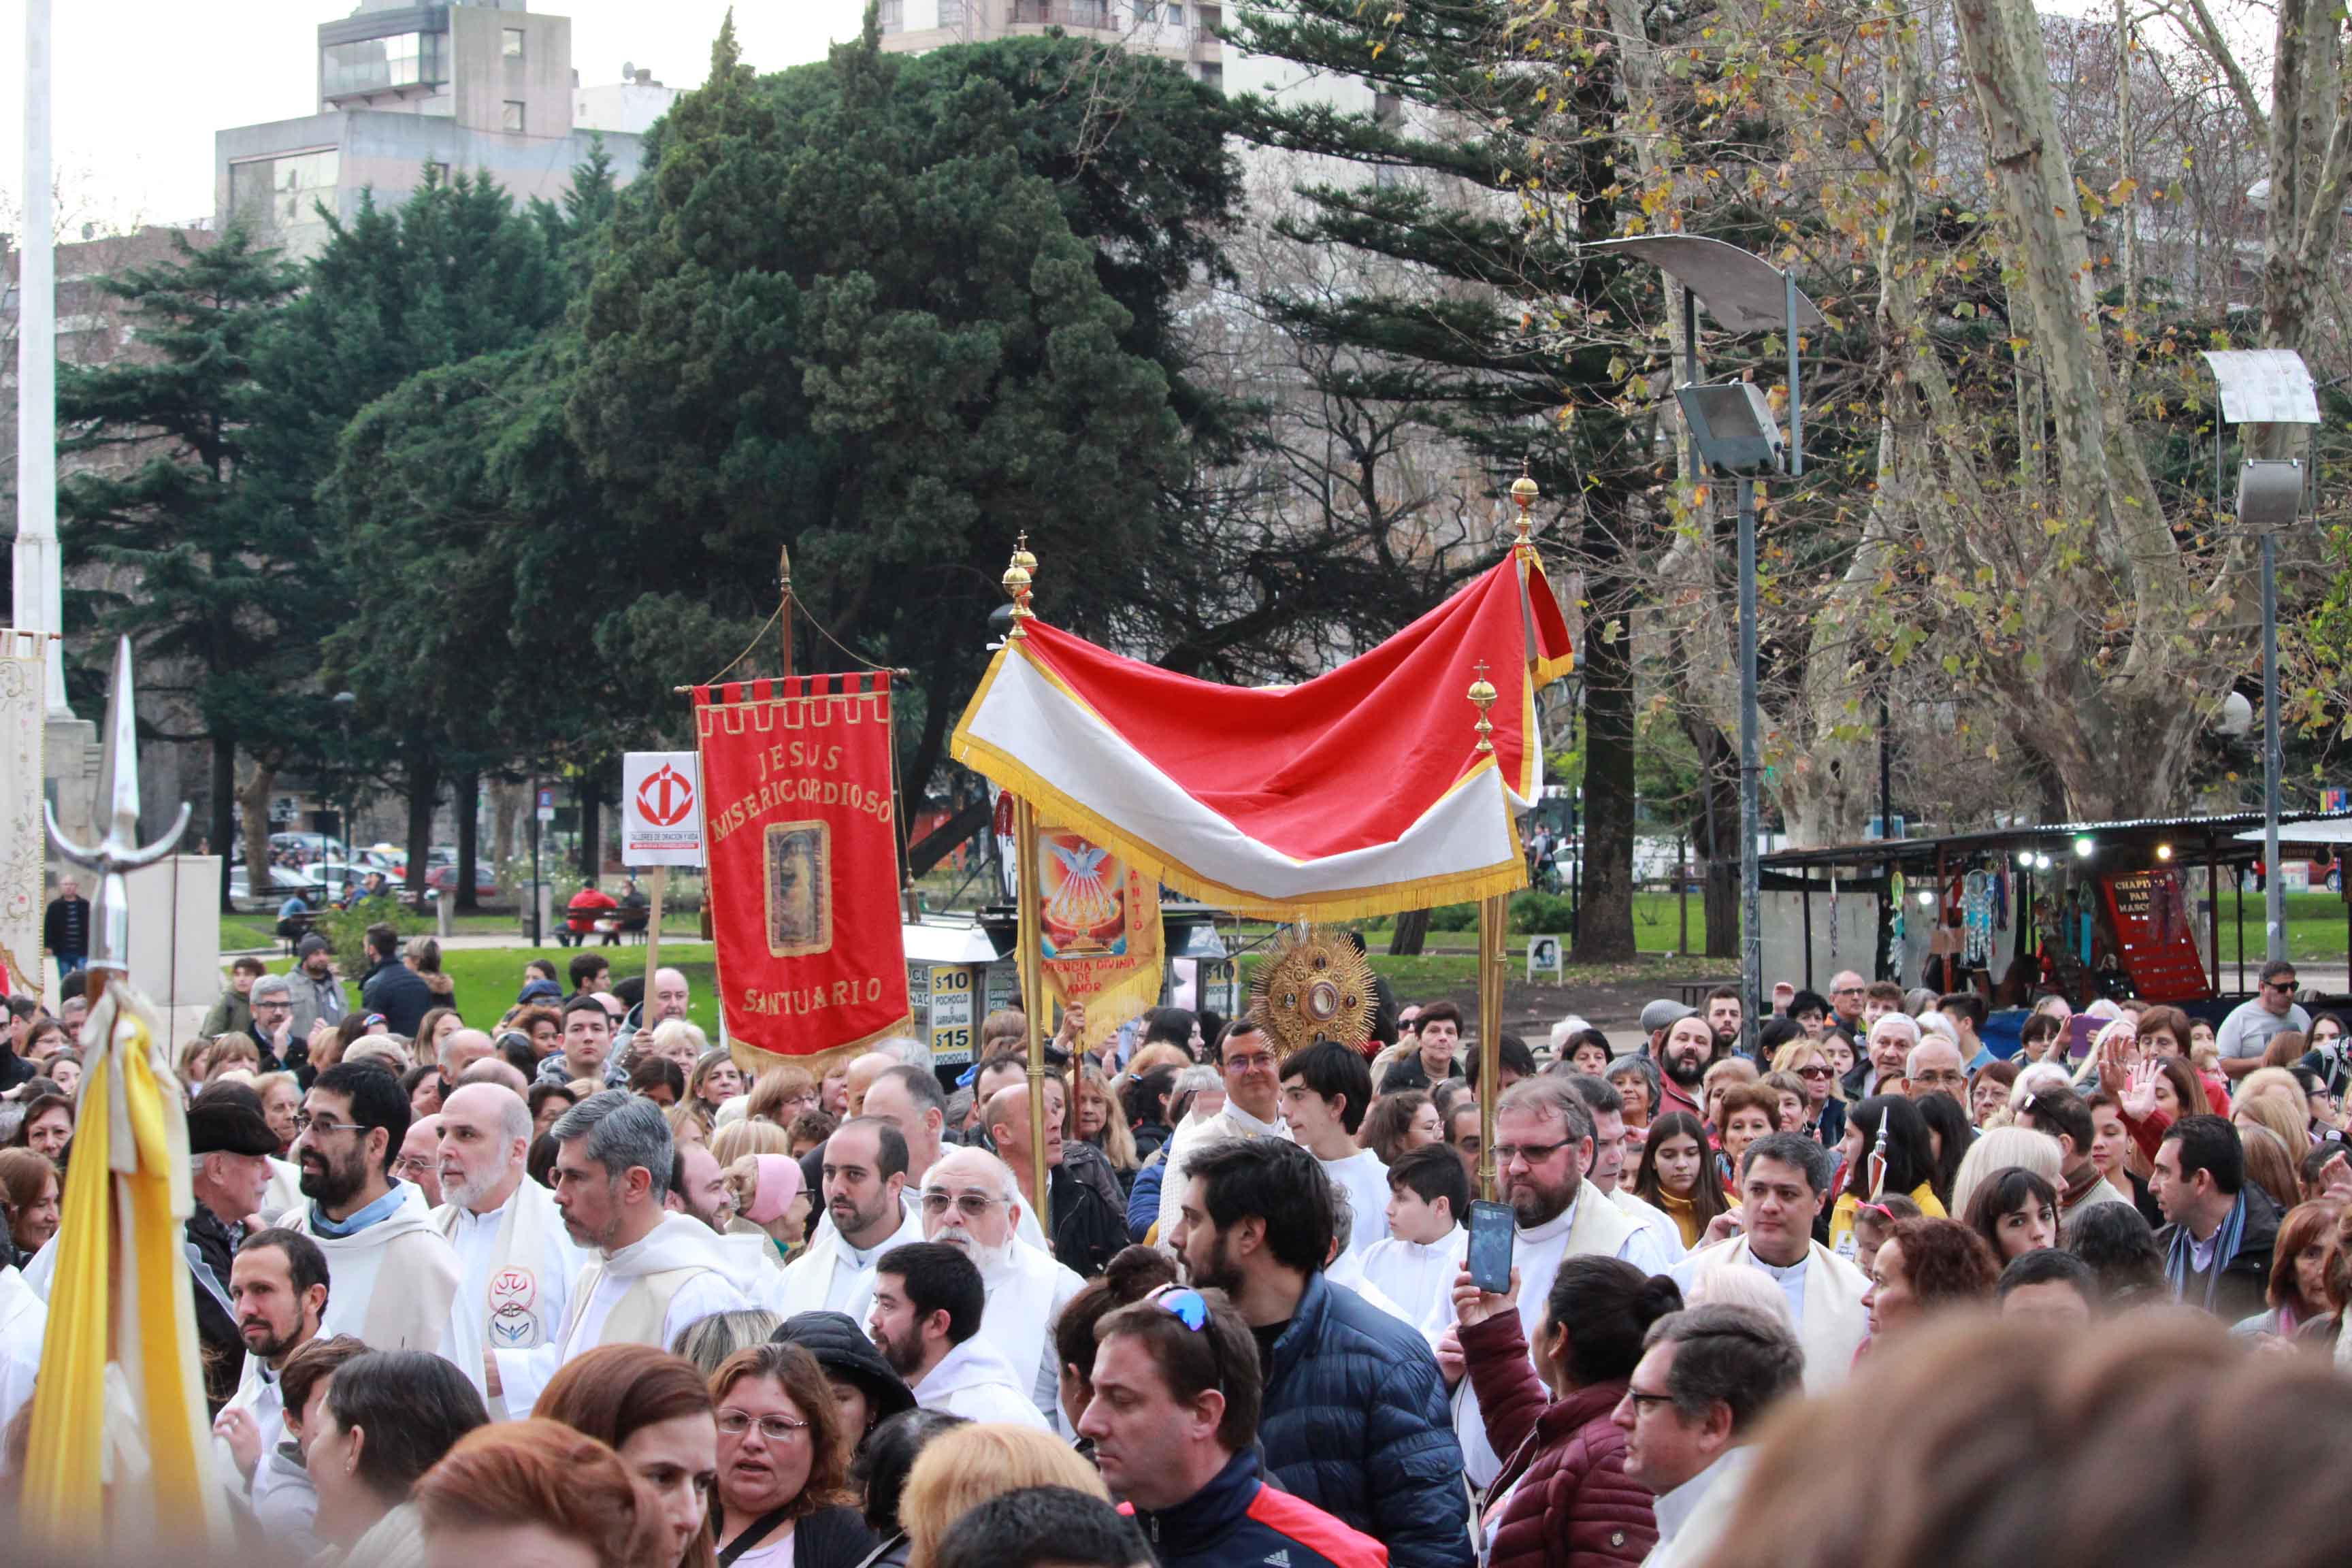 Miles de fieles manifestaron su fe en Corpus Christi